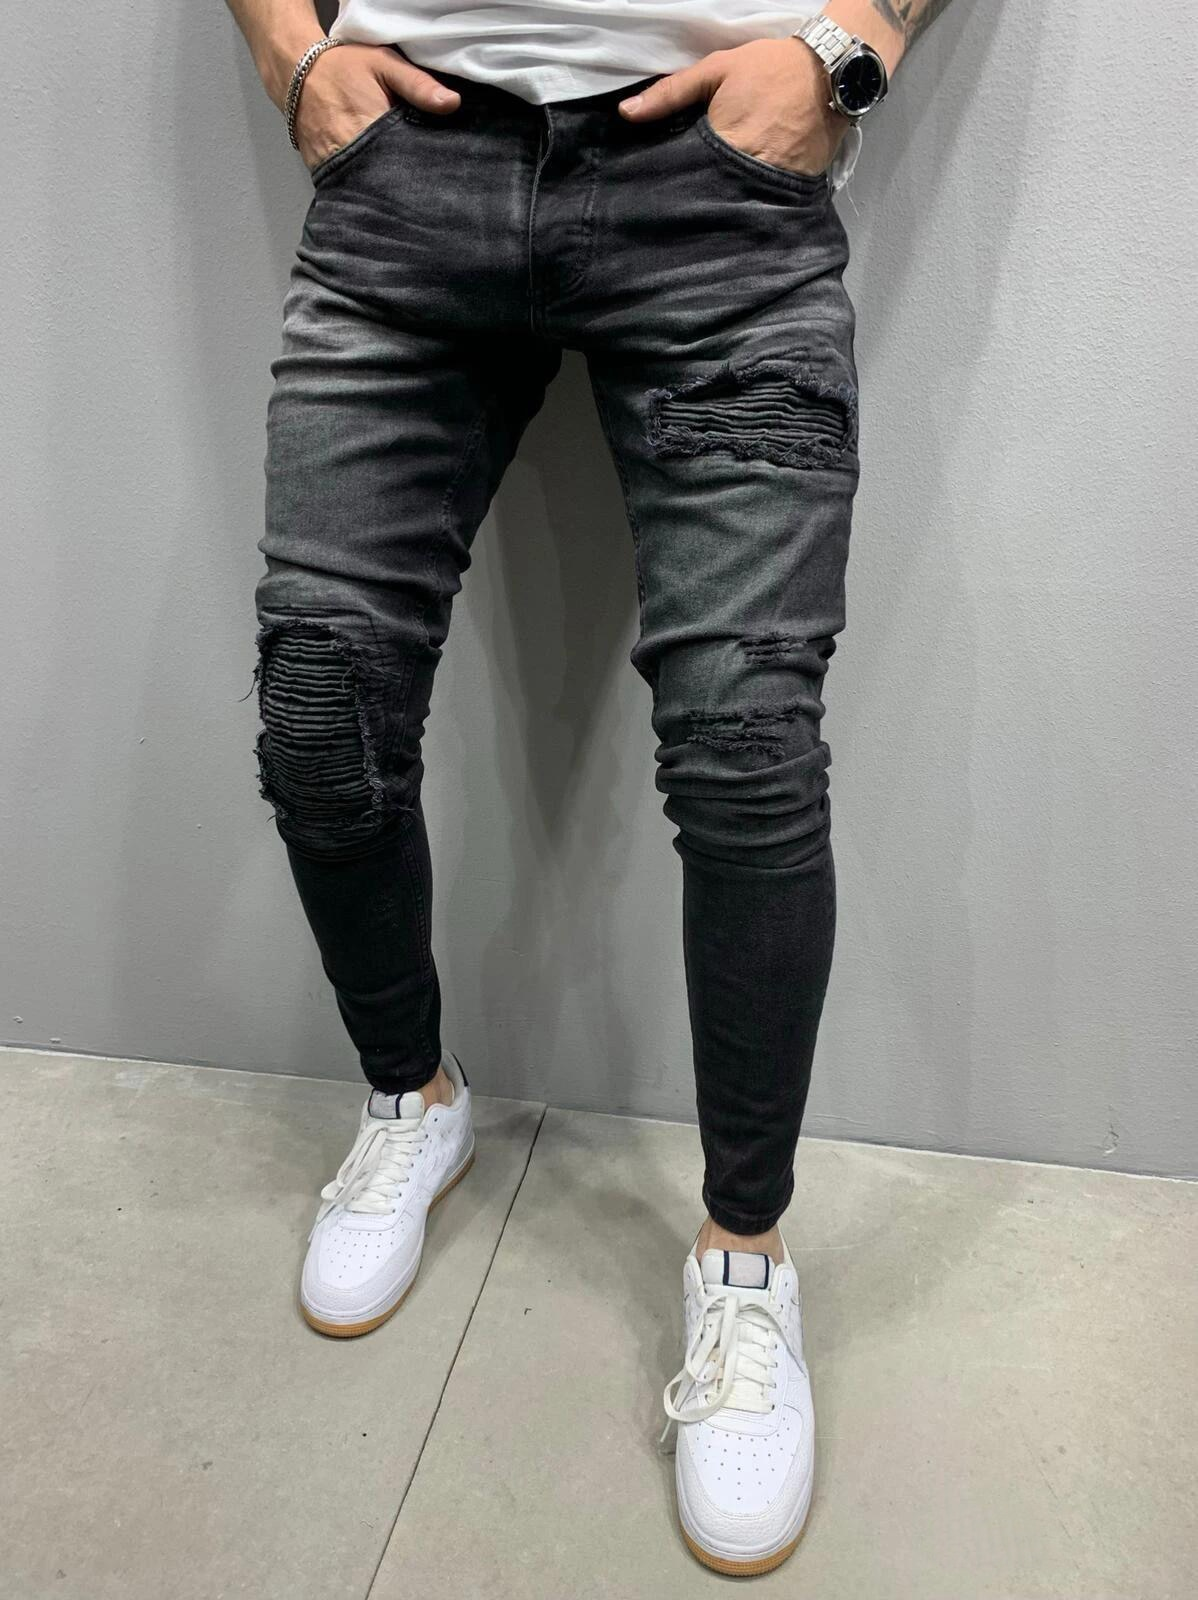 AliExpress - Casual Party Jeans Men Skinny Jeans Men 2020 Stretch Ripped Pants Streetwear Mens Denim Elastic Waist Black Blue pants S-3XL